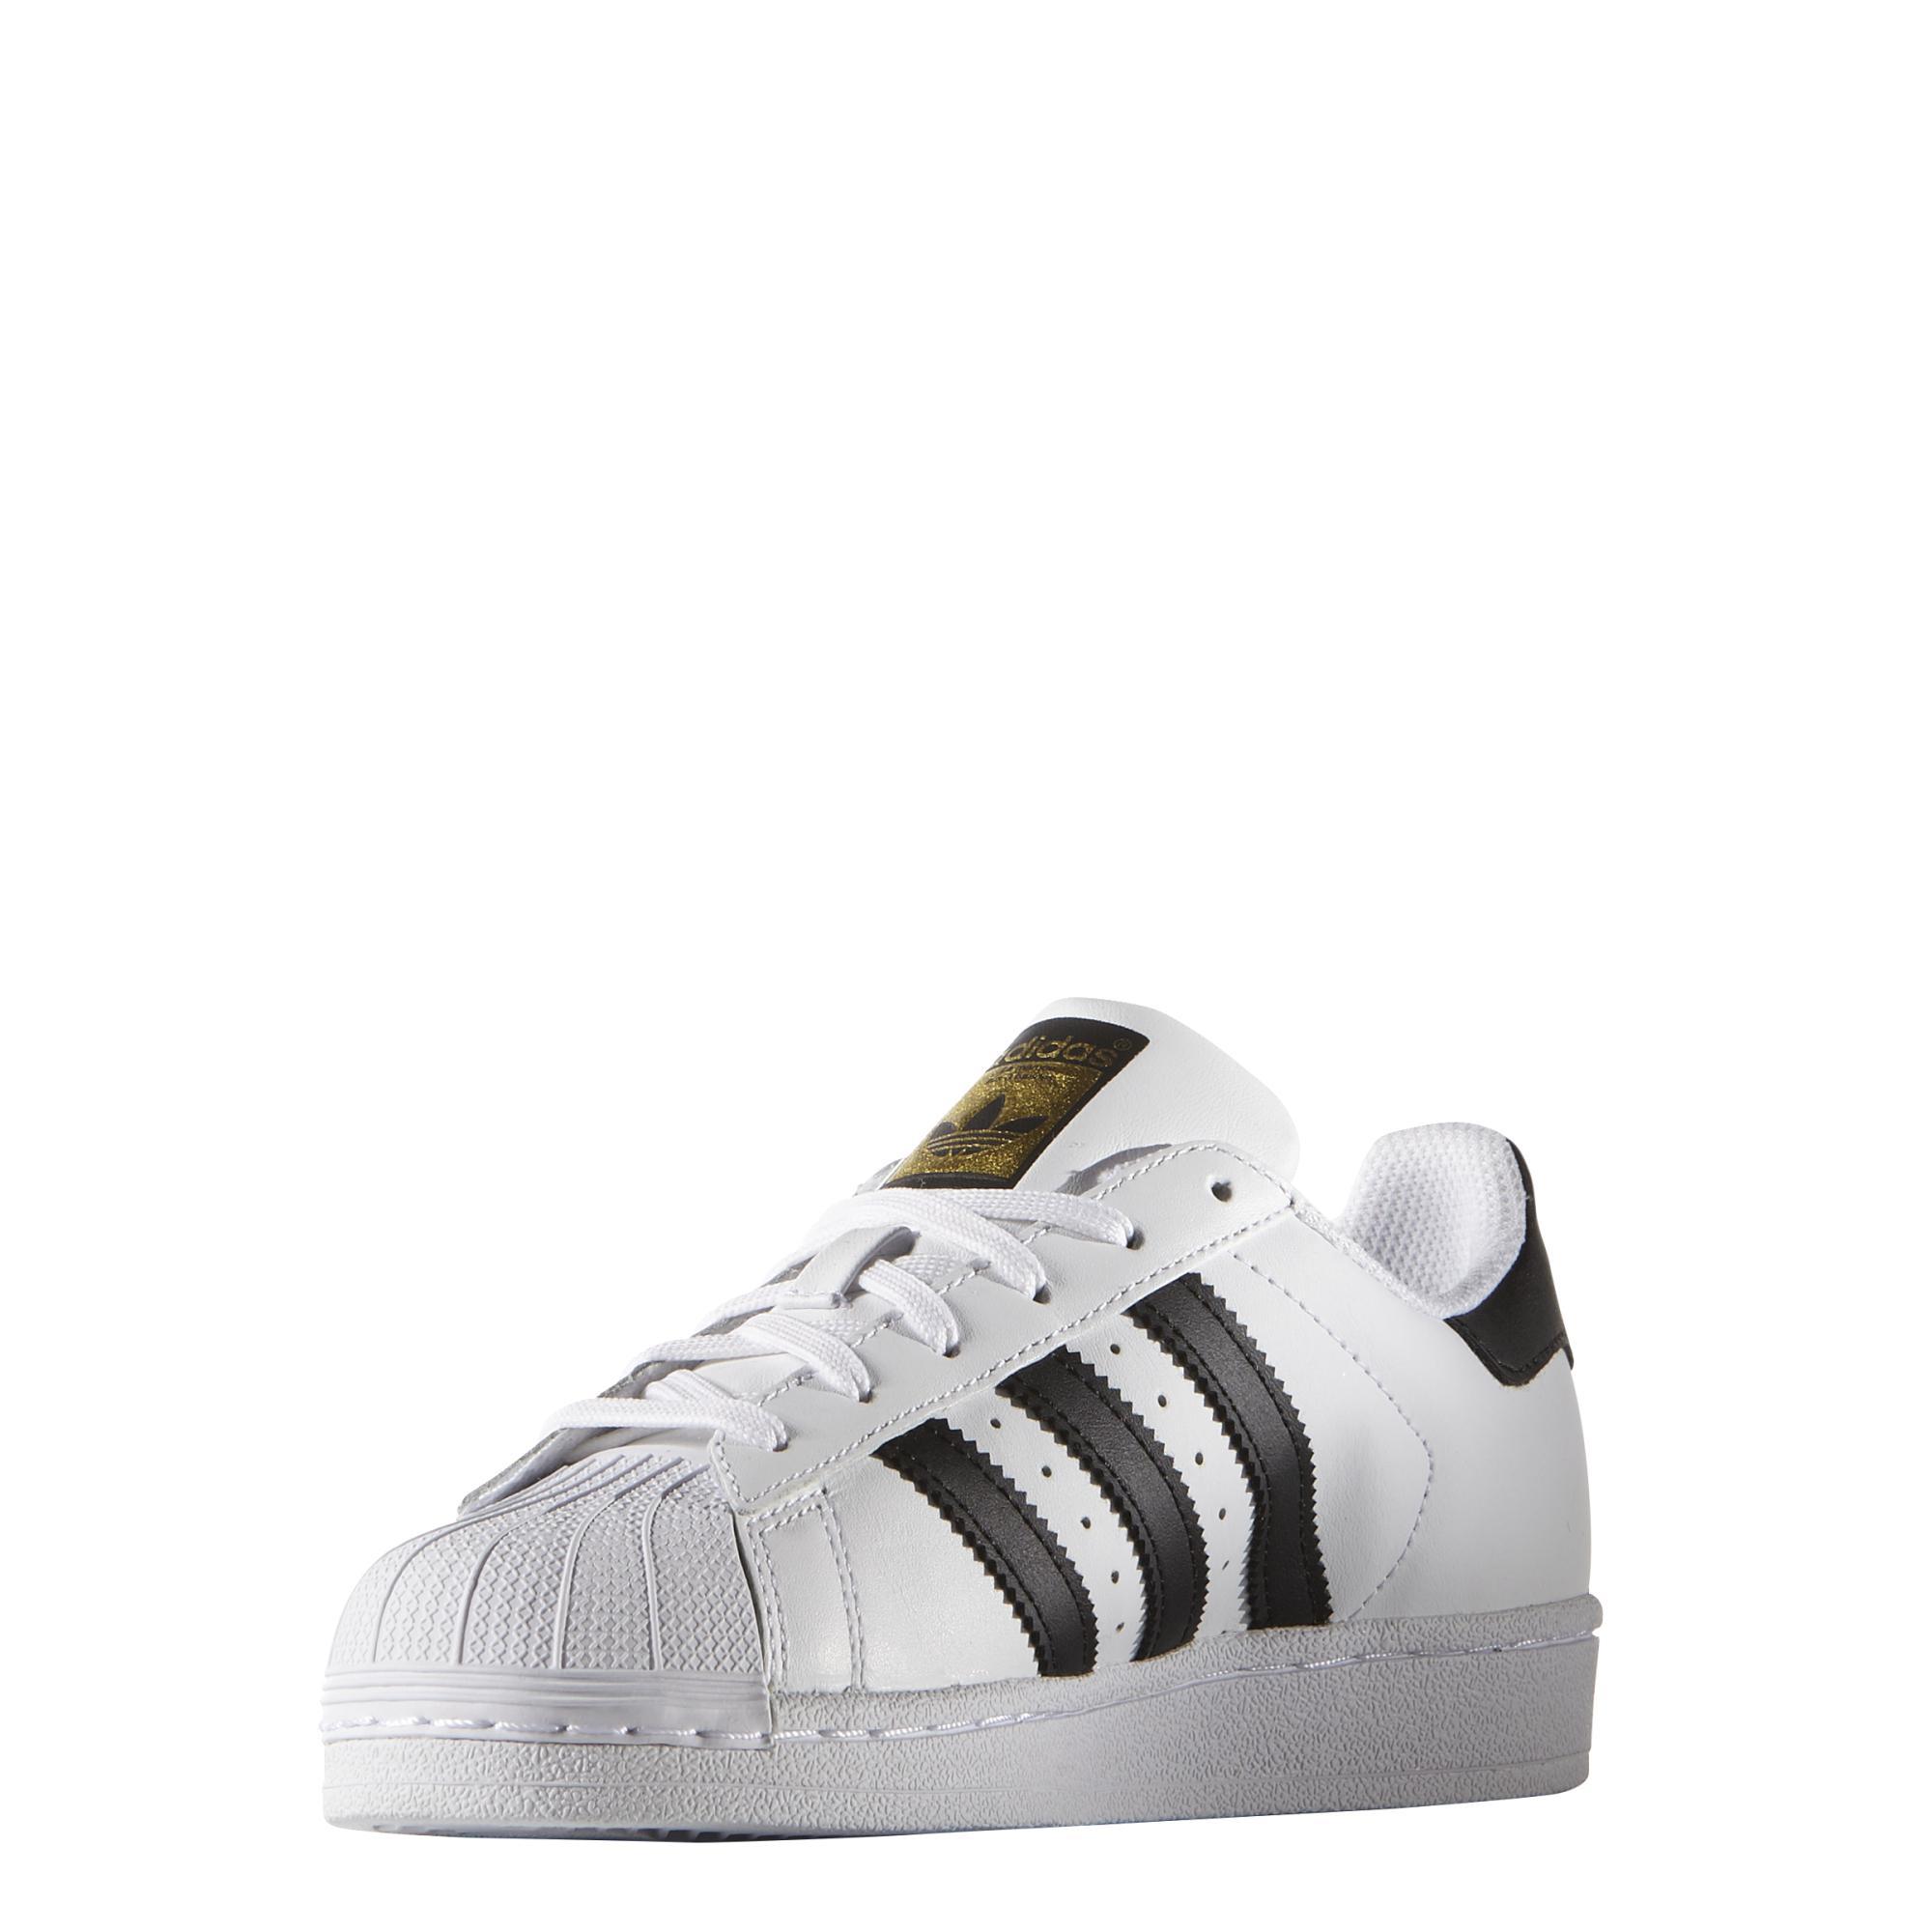 premium selection a0ef4 60844 Adidas Originals SUPERSTAR J (blanconegrooro), .